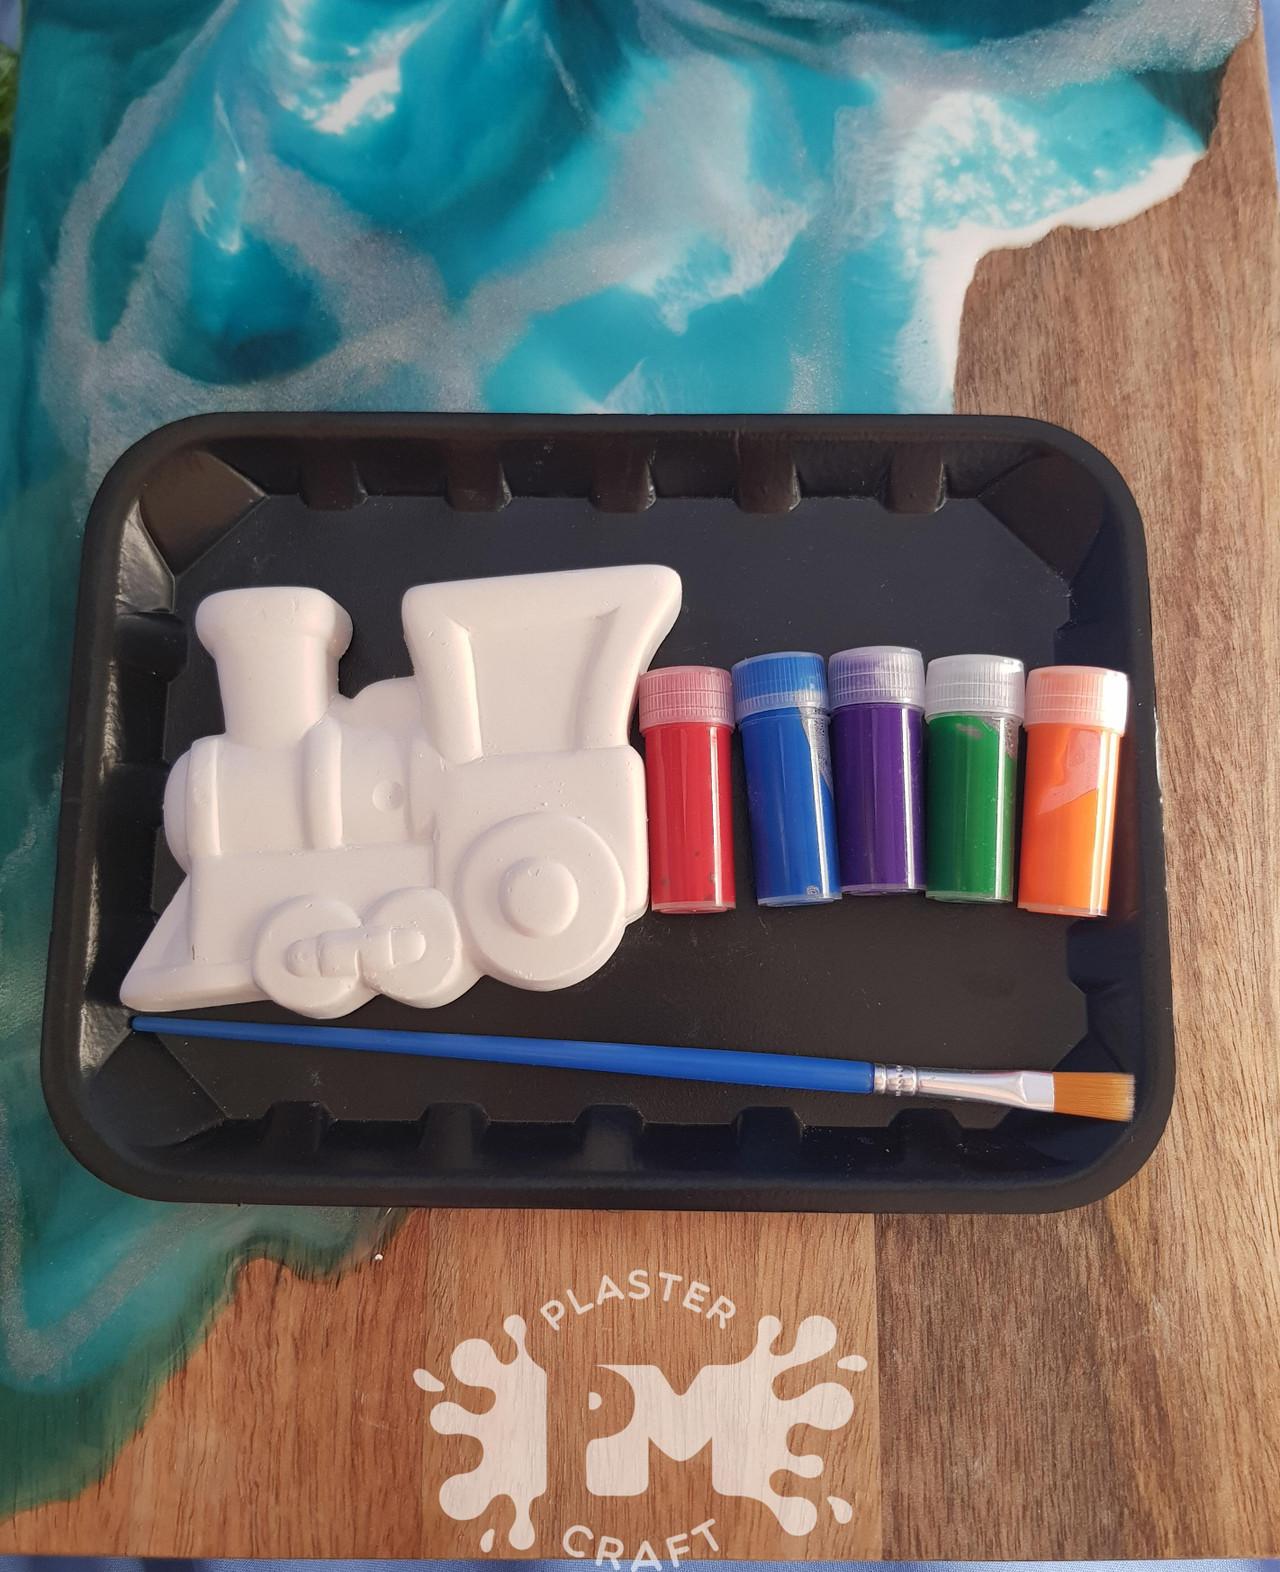 Plaster train